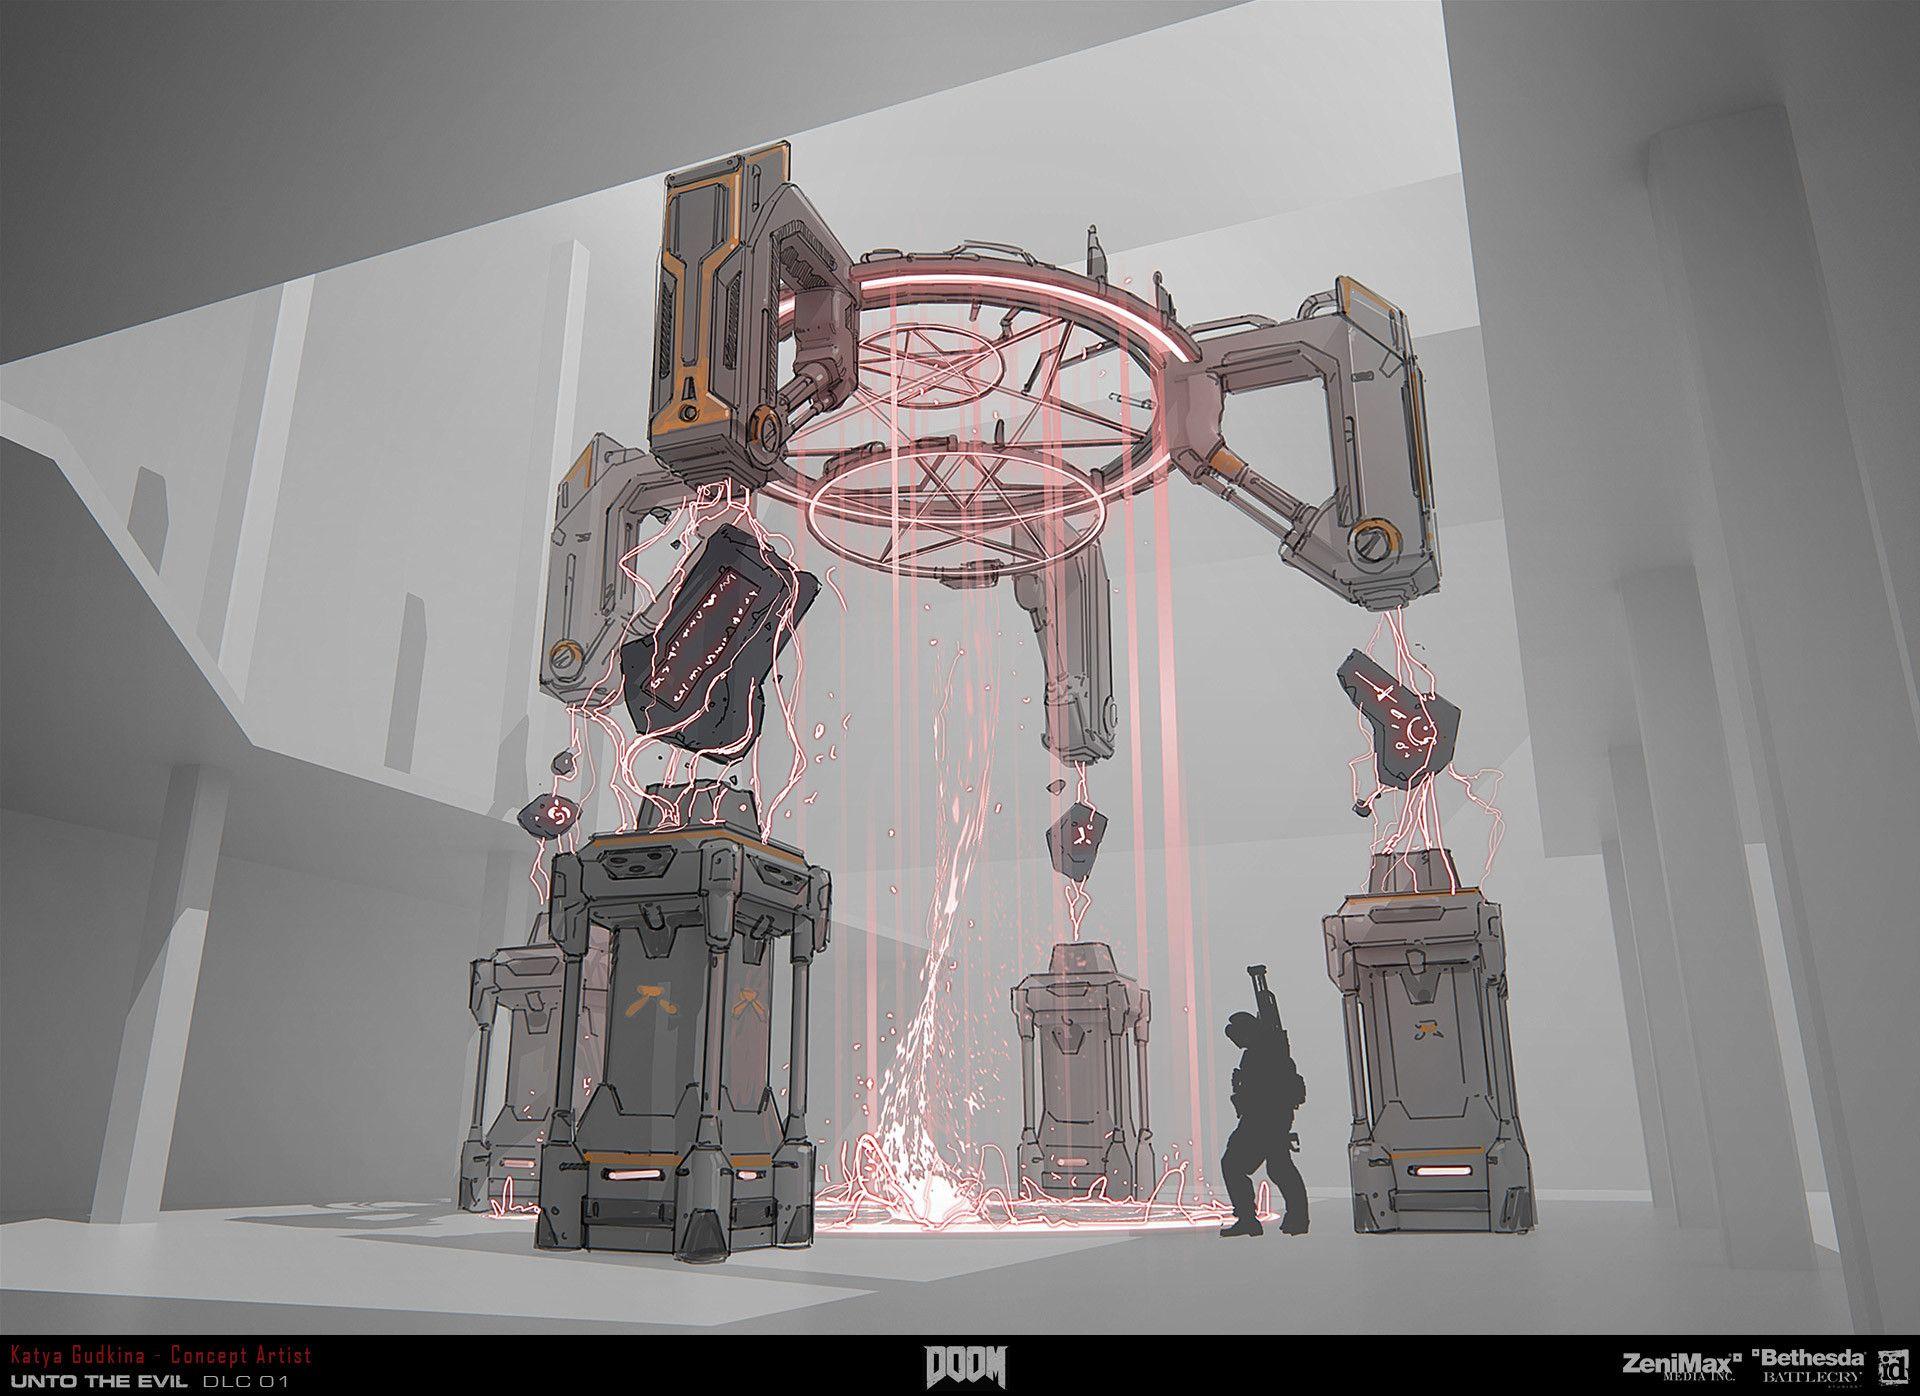 ArtStation - Concept art for Doom 4 , Katya Gudkina